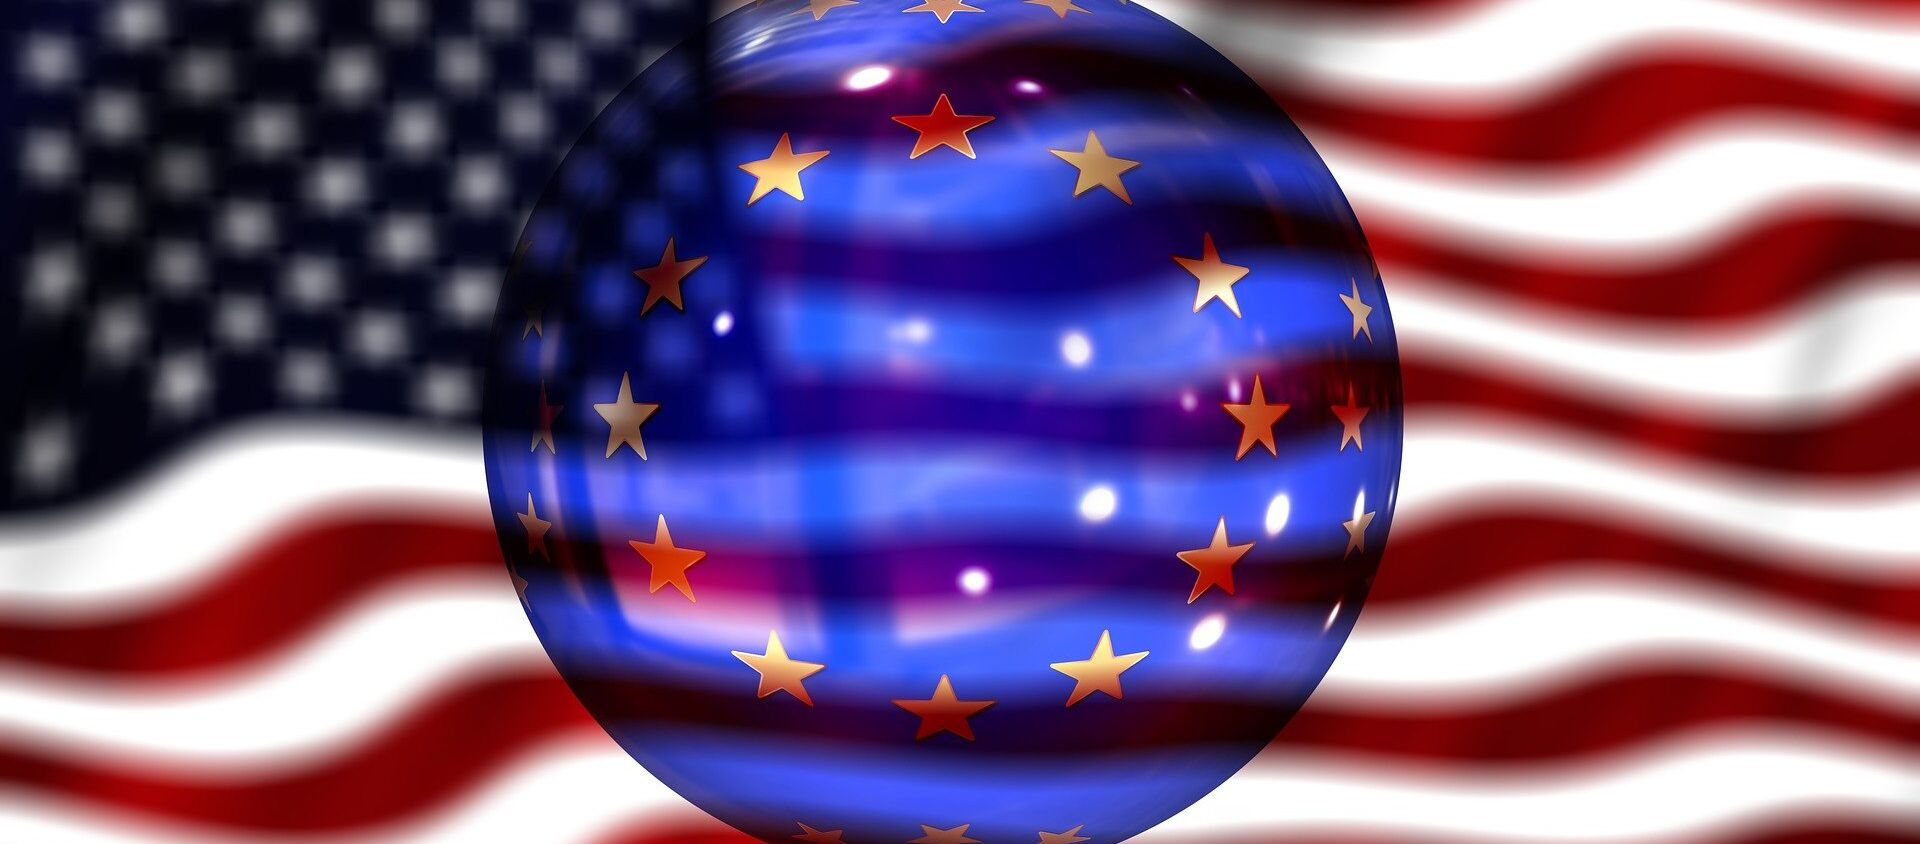 quan hệ Mỹ-EU - Sputnik Việt Nam, 1920, 18.05.2021